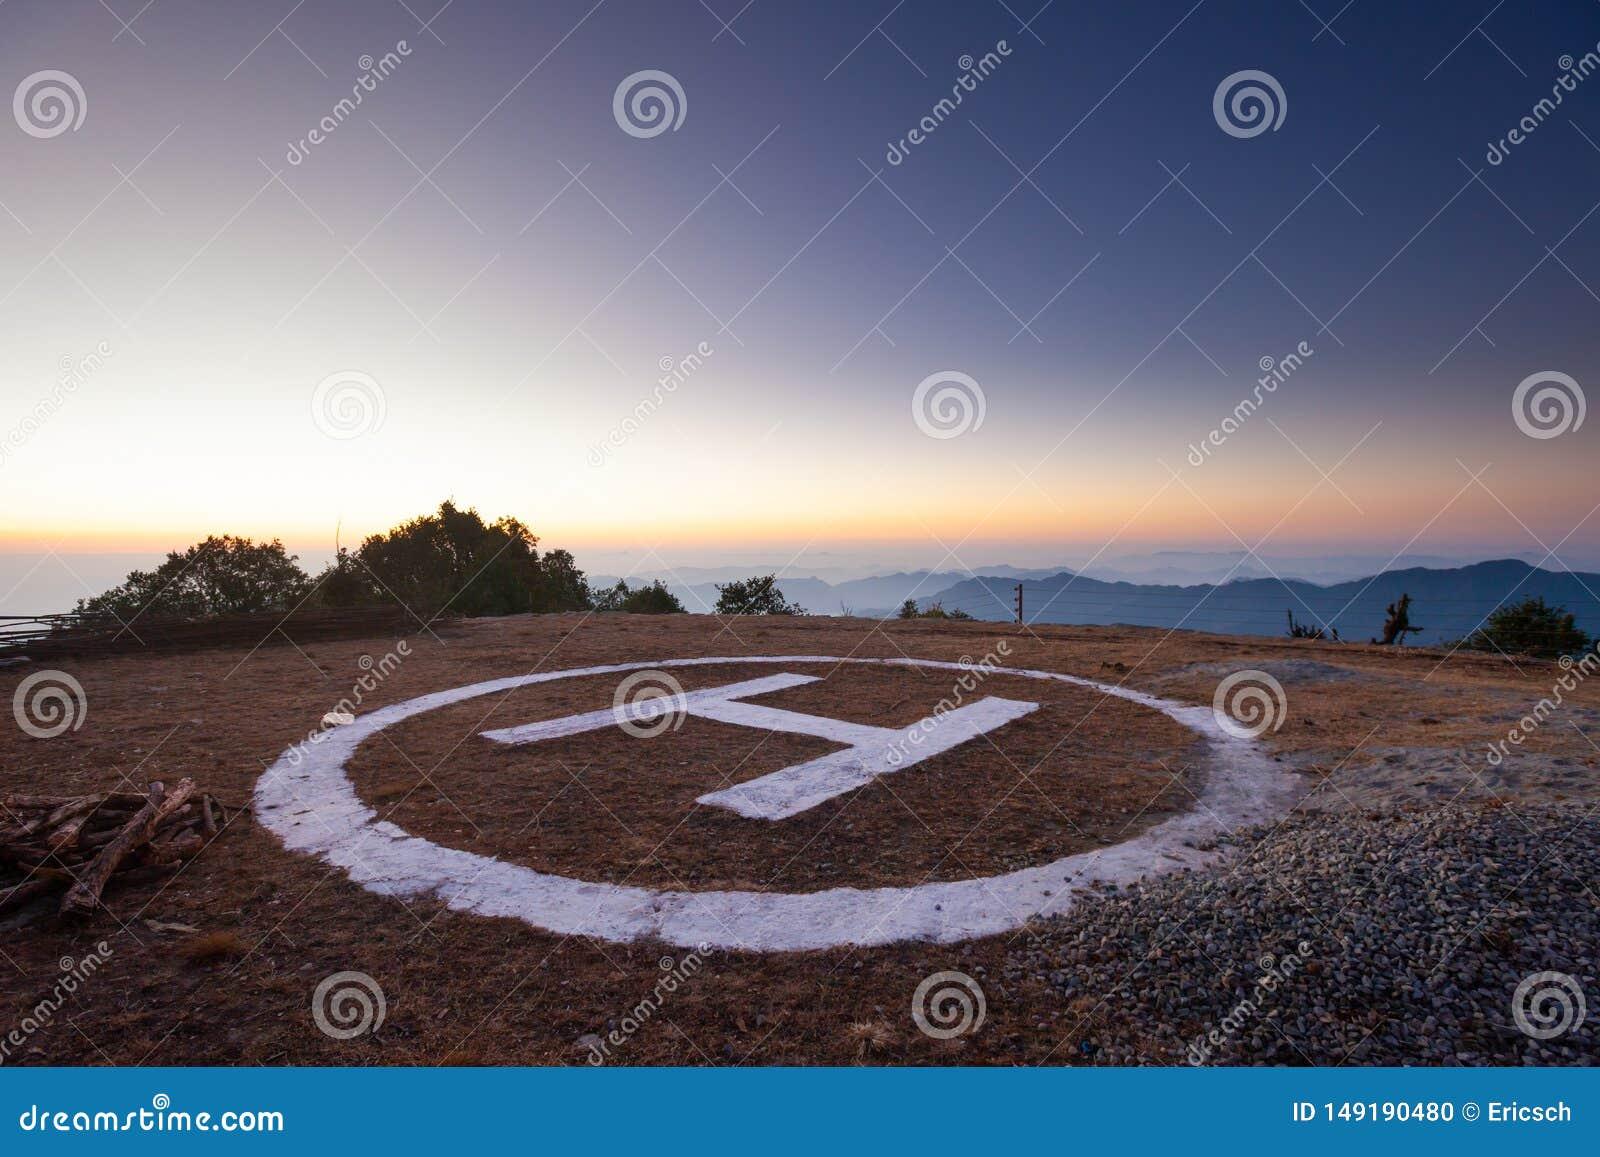 Nepal helipad